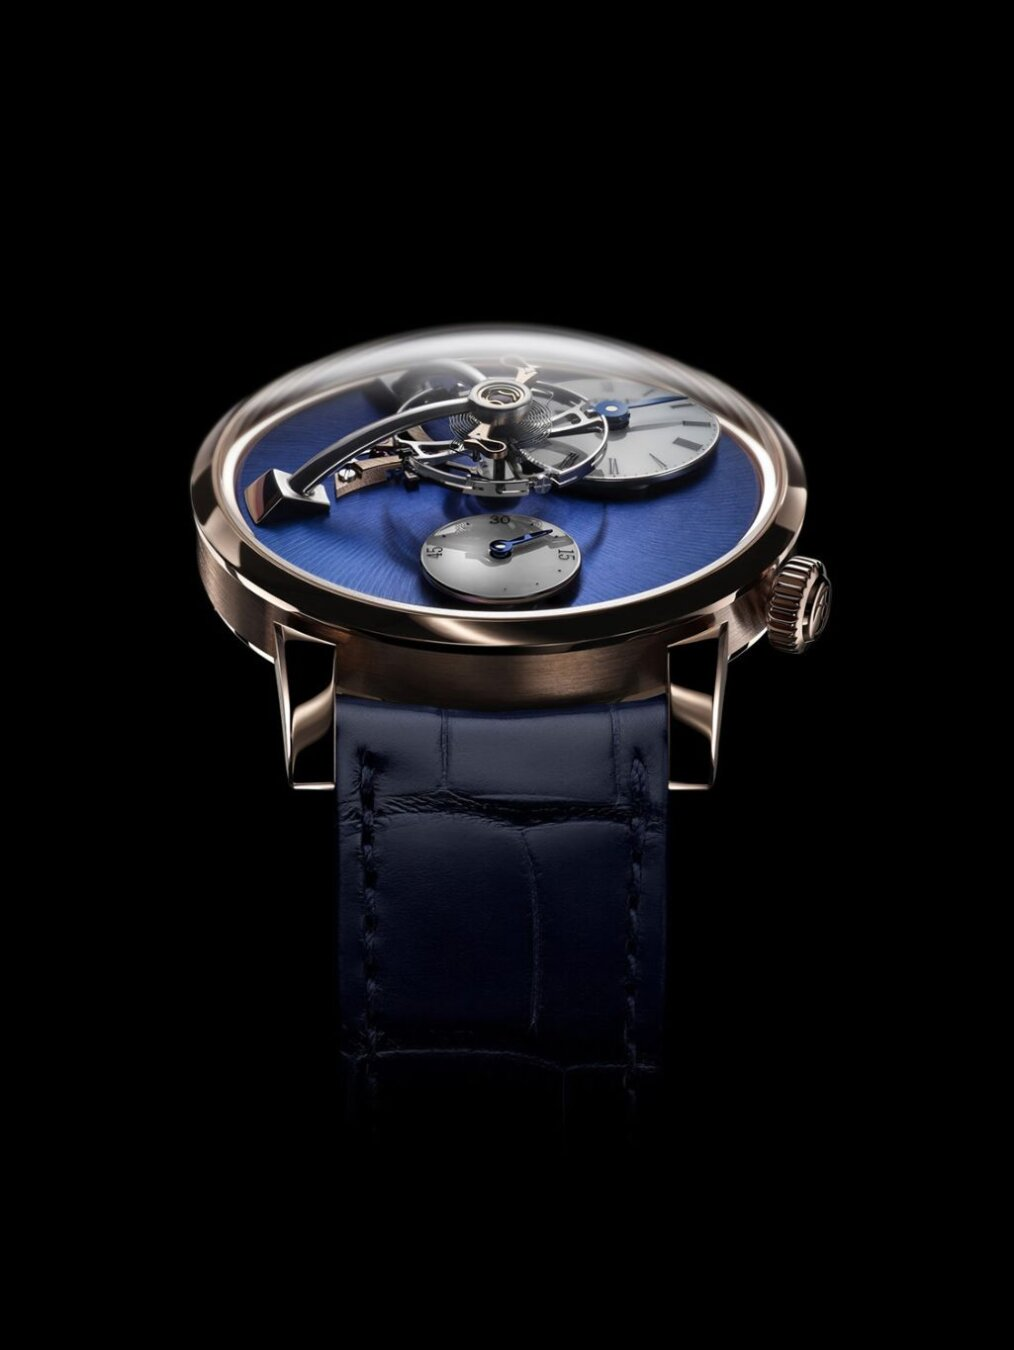 Legacy Machine 101 rose gold blue dial